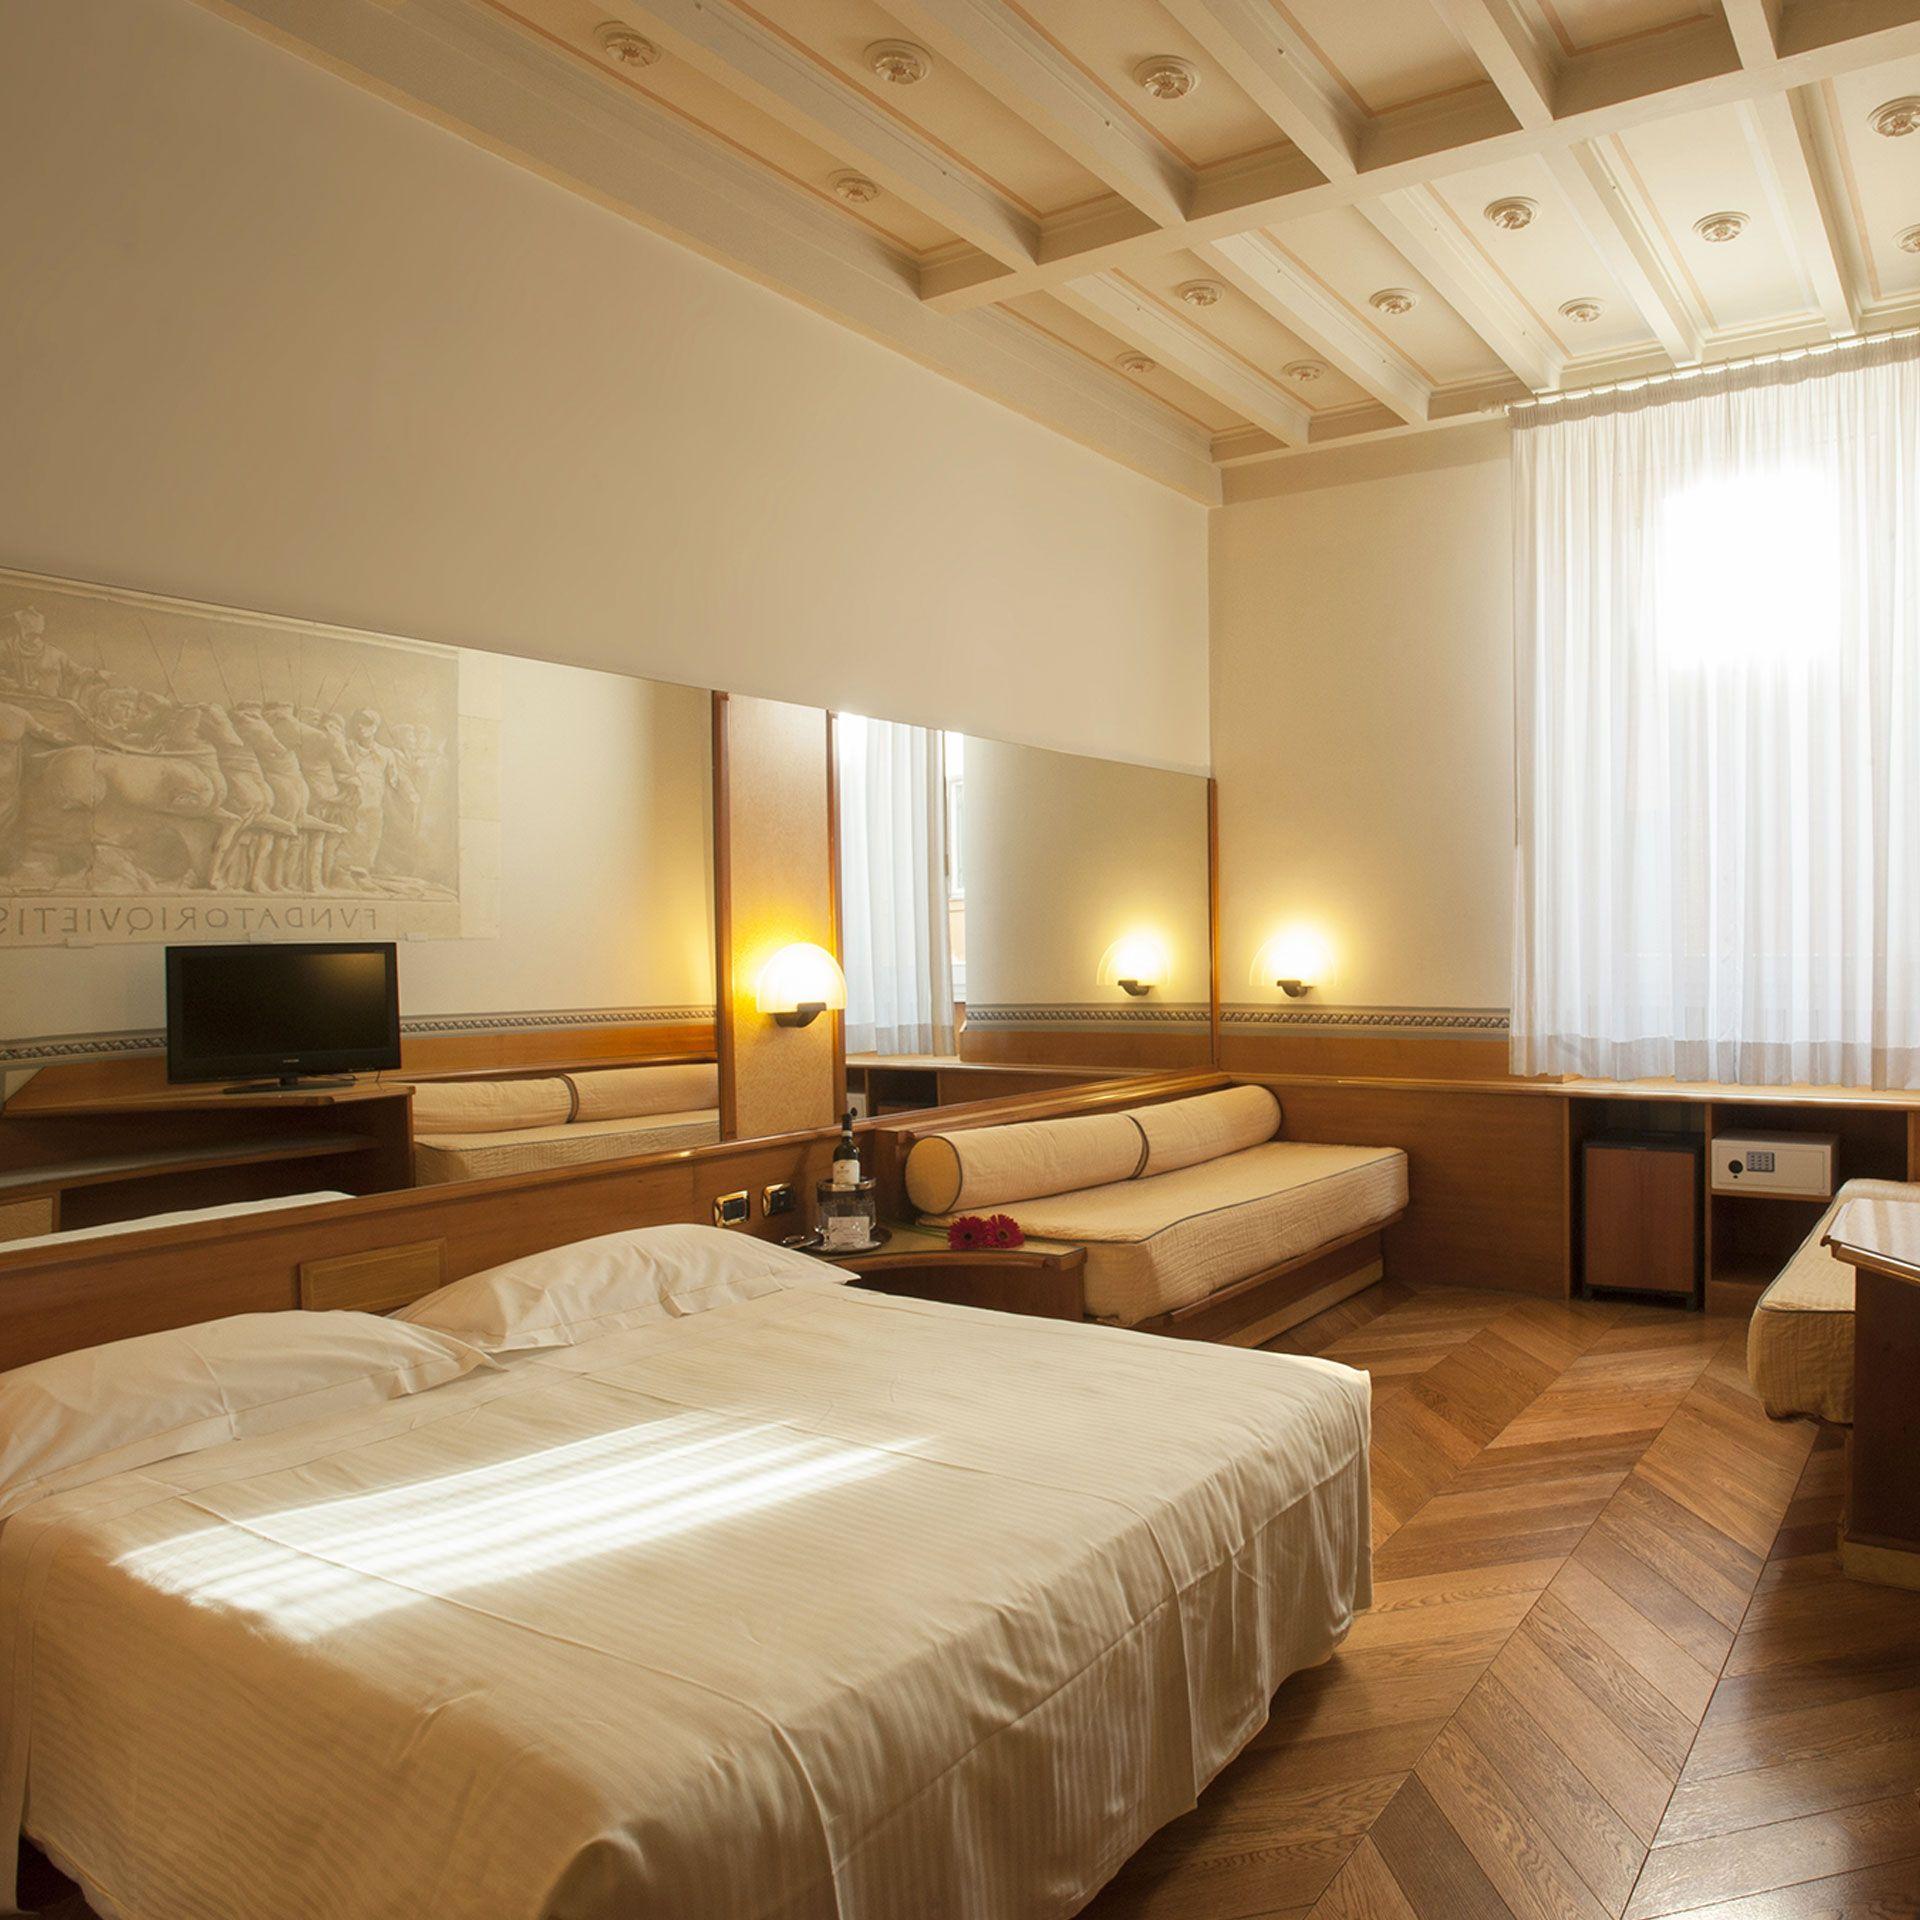 Rome Hotel Near Vatican Sant Anna 3 Star